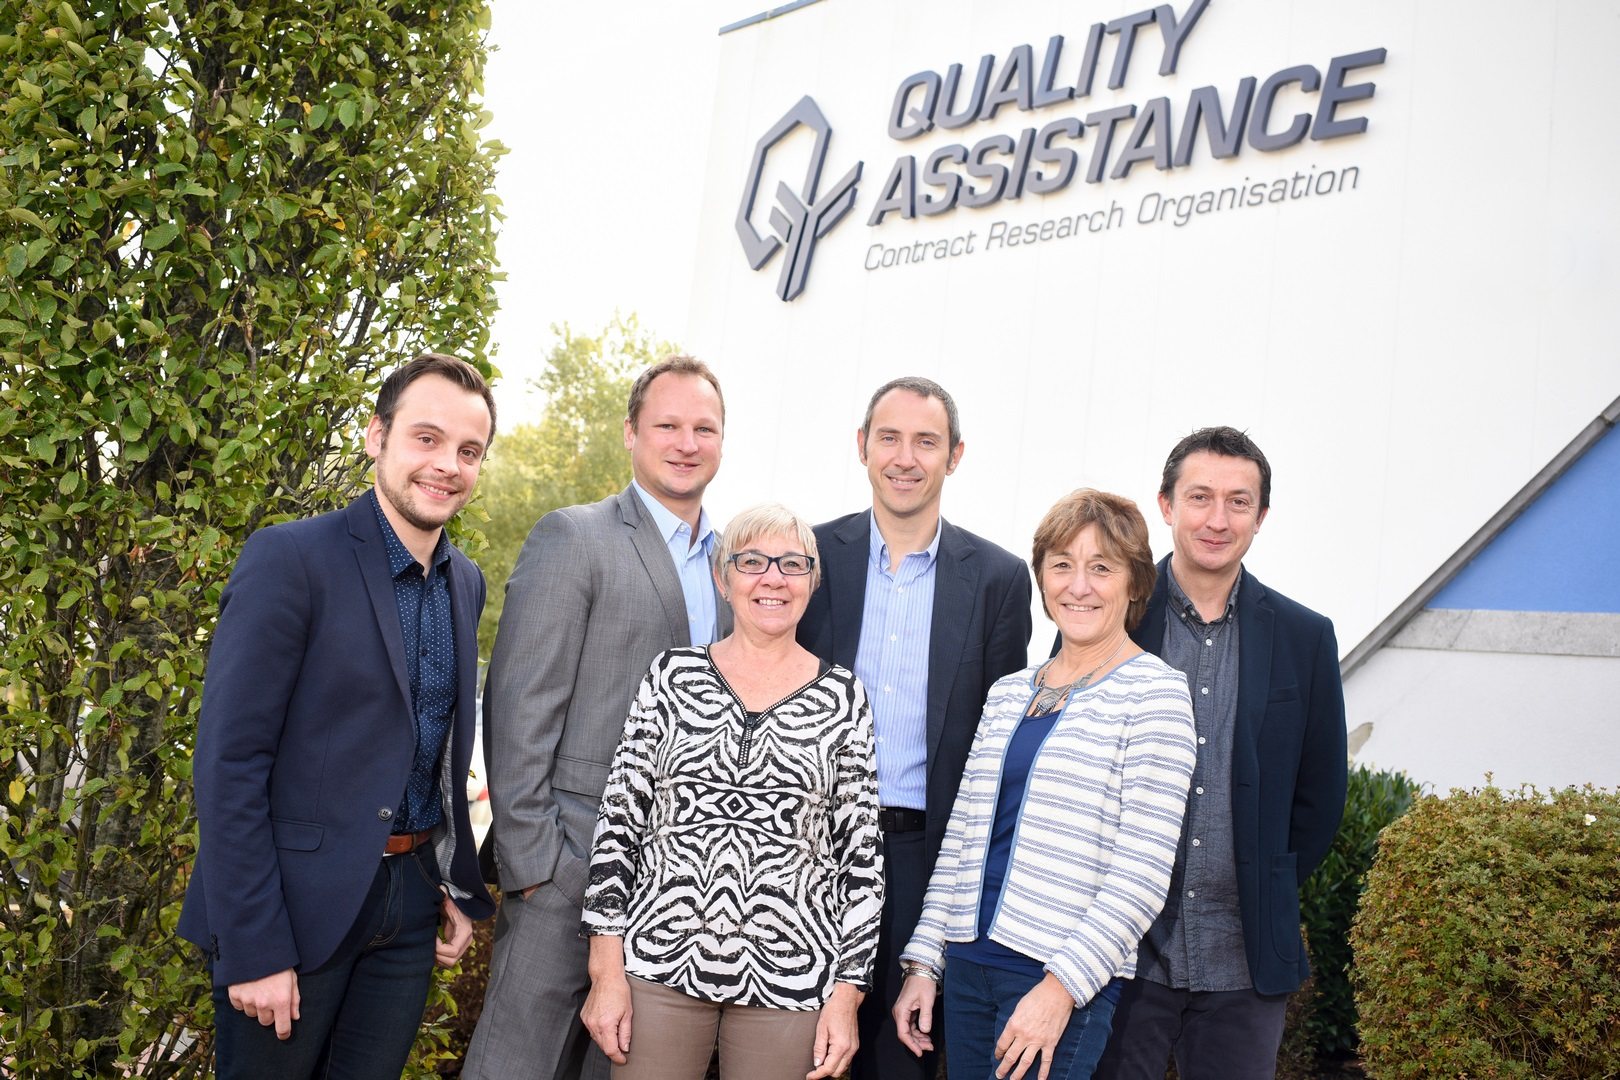 Quality Assistance Business Development